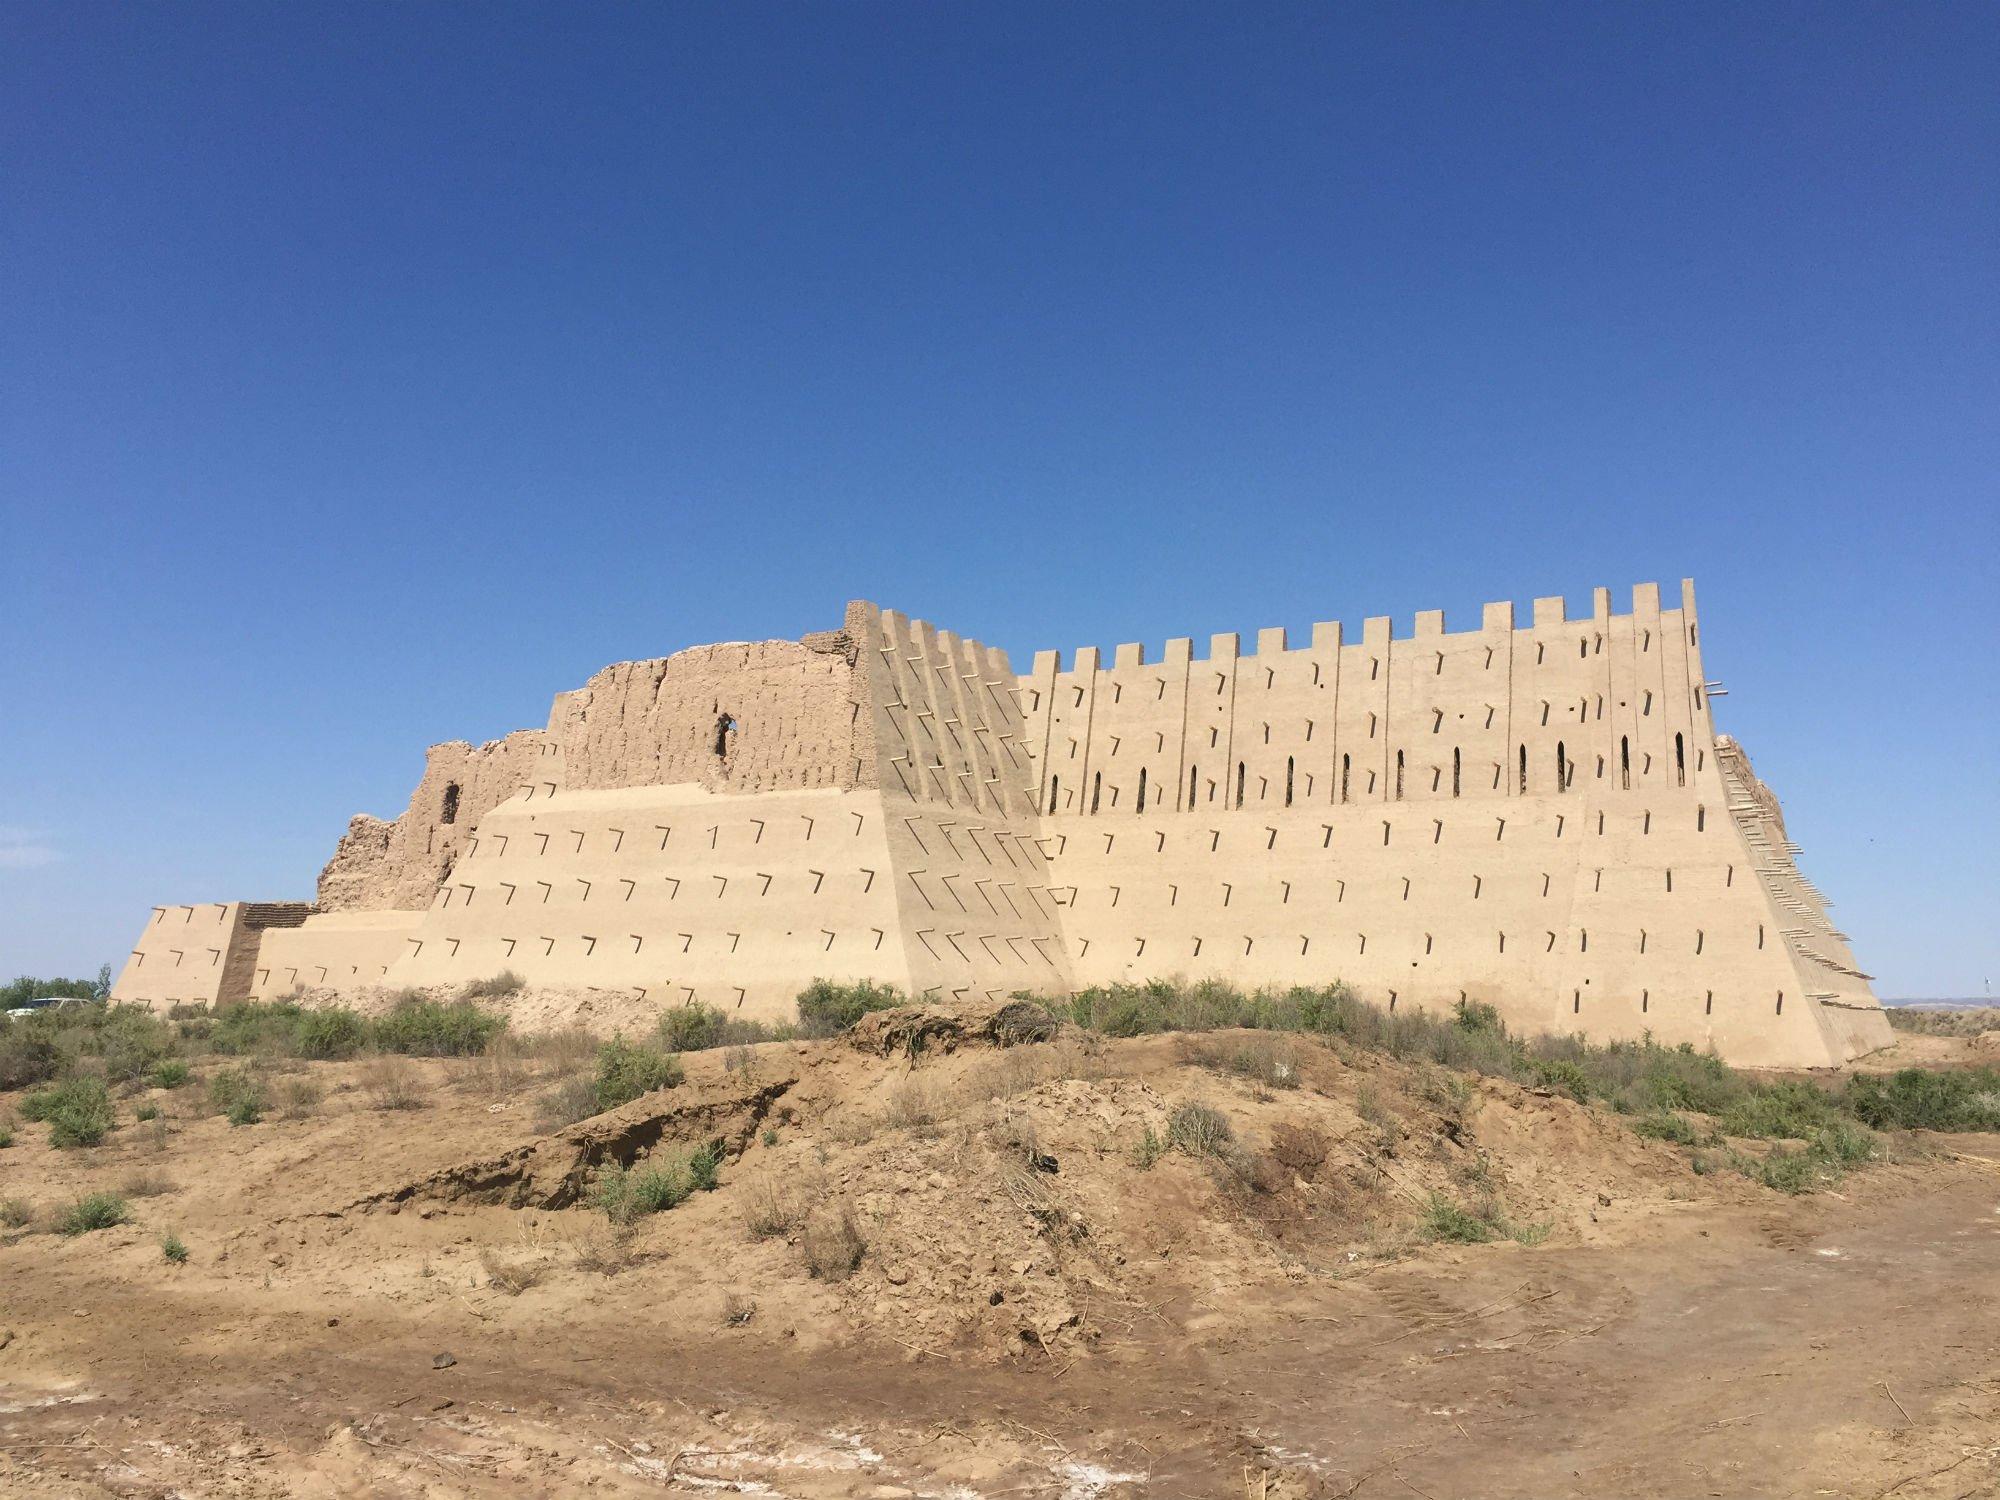 UZBEKISTAN Khiva fortezze nel deserto2 VIAGGIO IN UZBEKISTAN